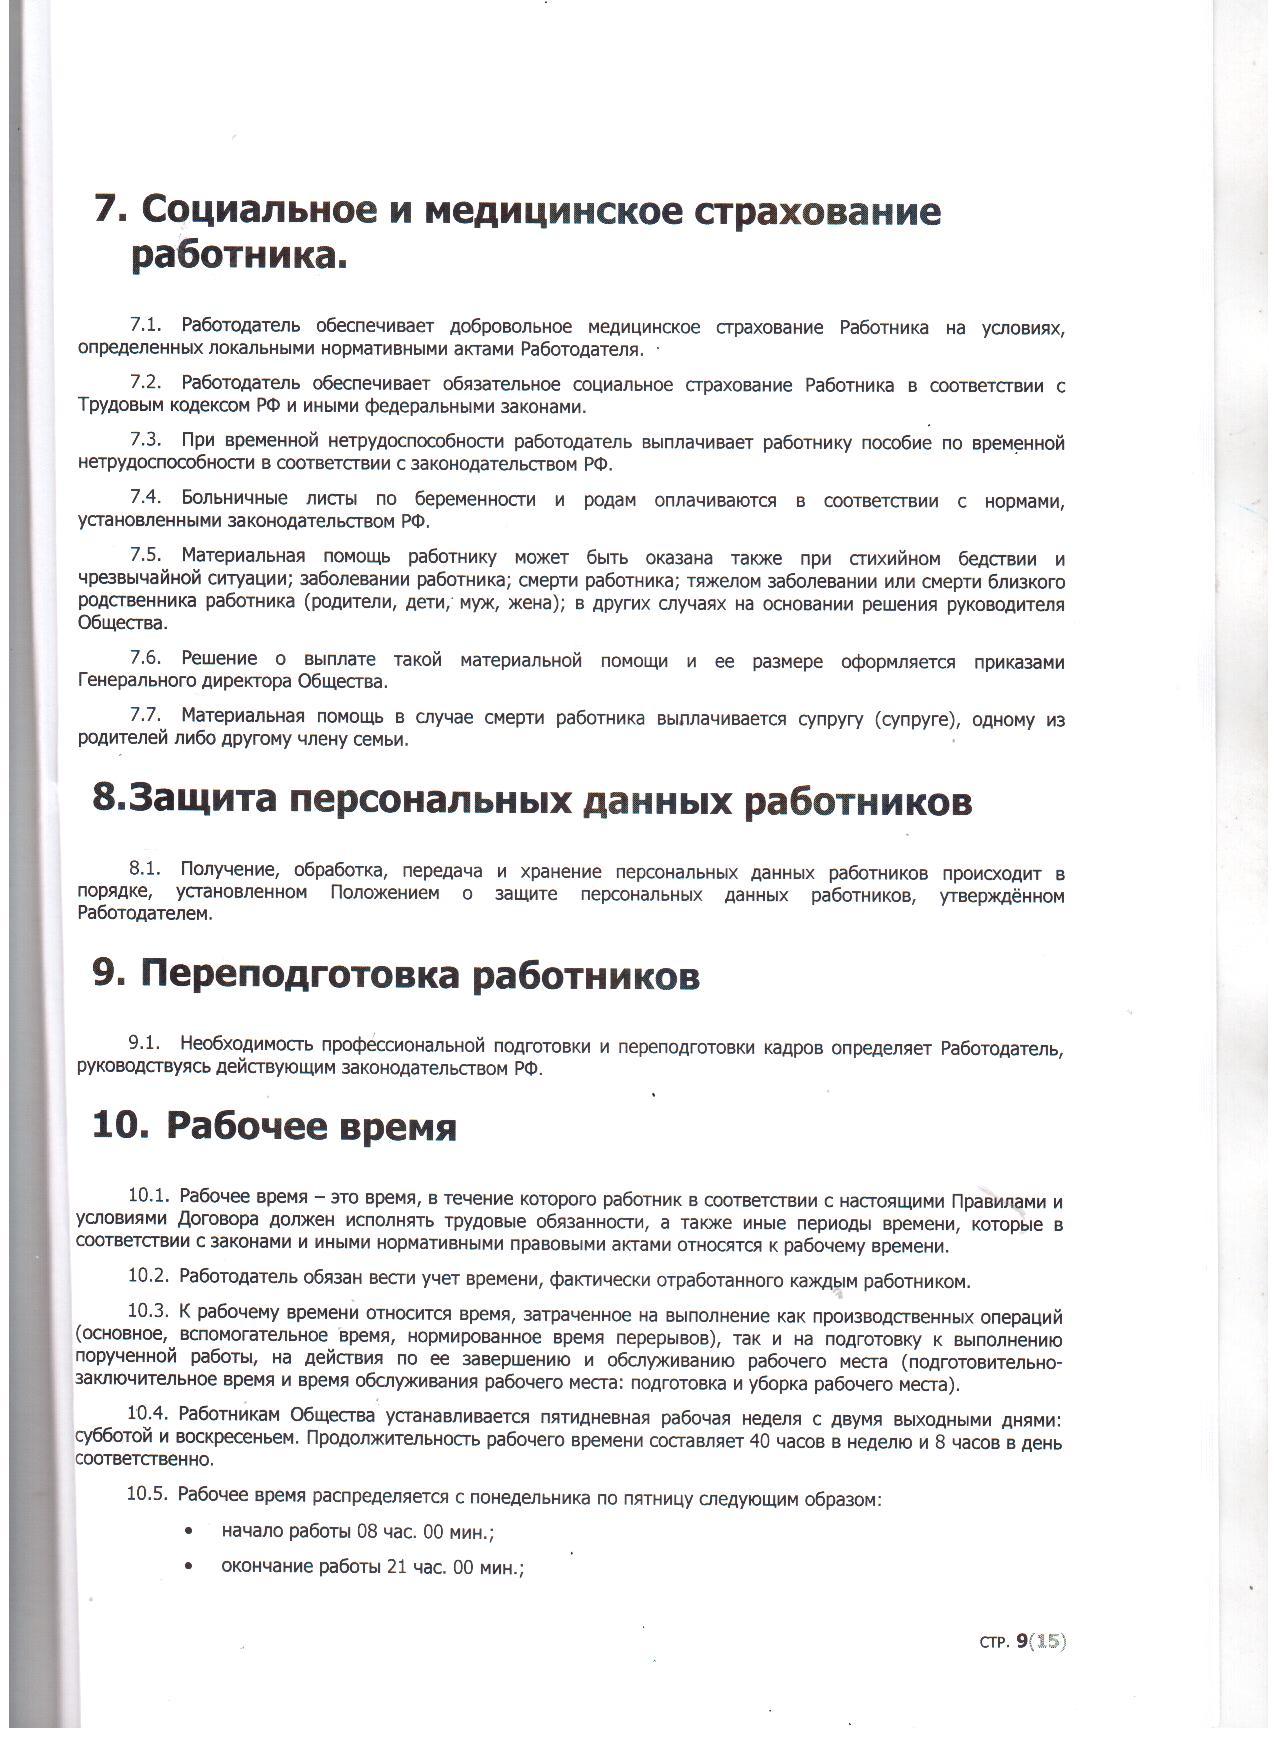 Правила внутреннего трудоговоро распорядка 9